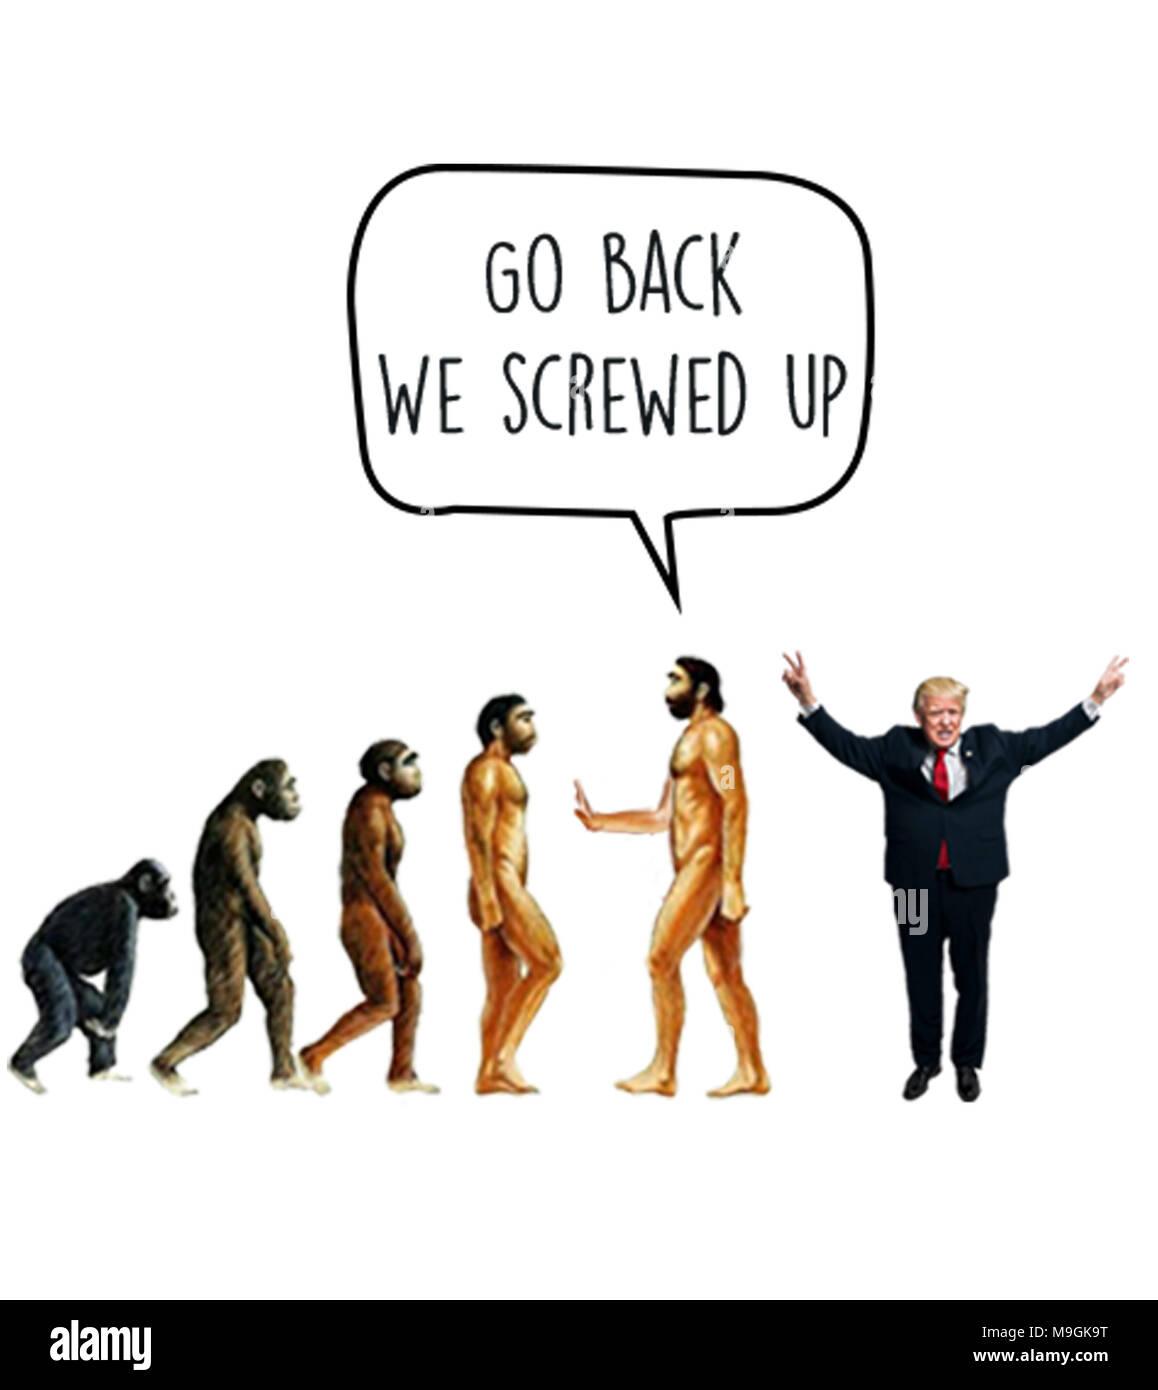 Go back We screwed up - Stock Image